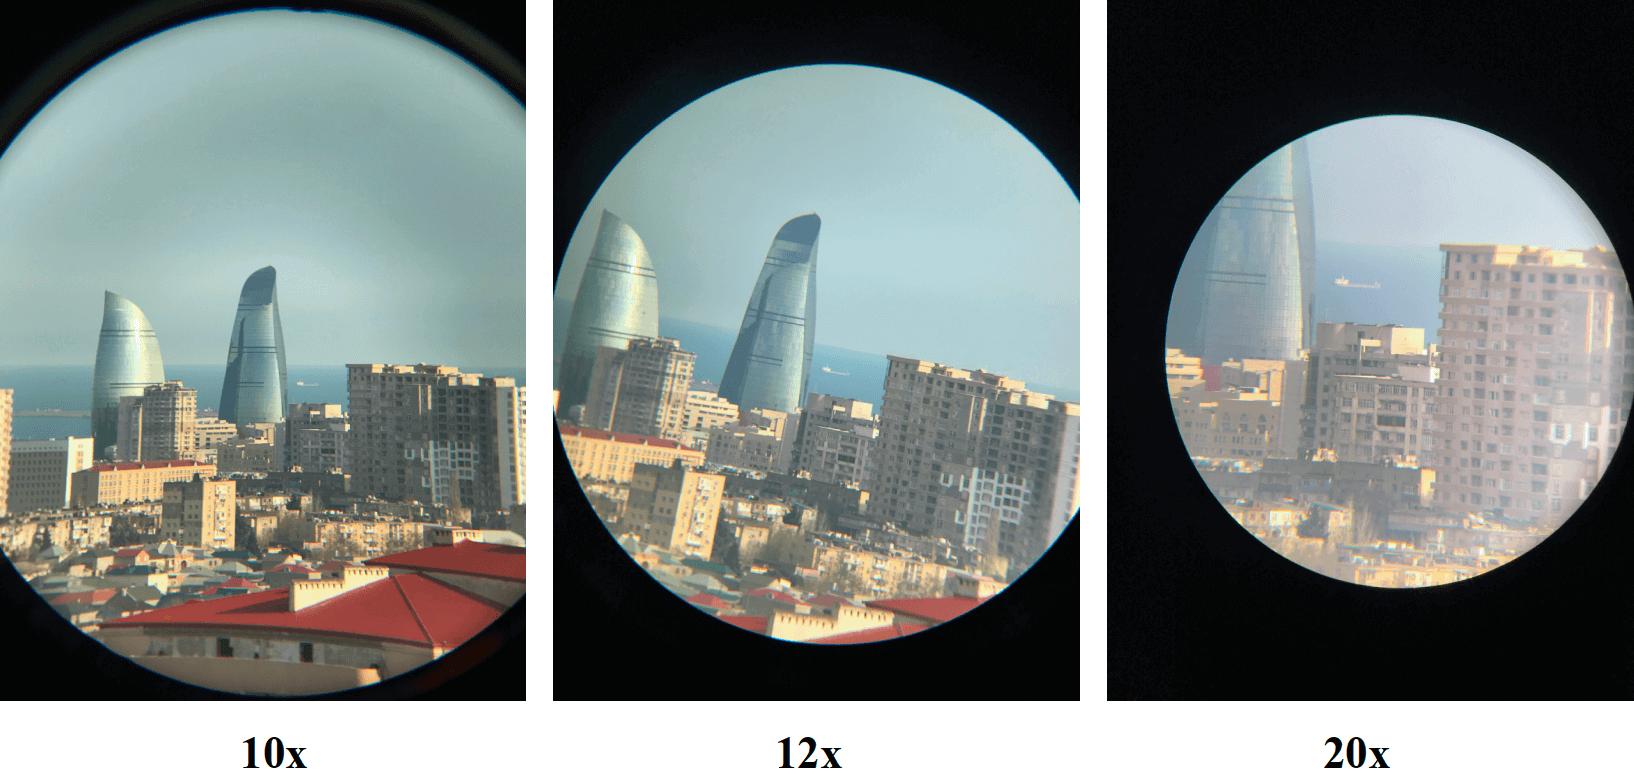 magnification-10x-12x-20x